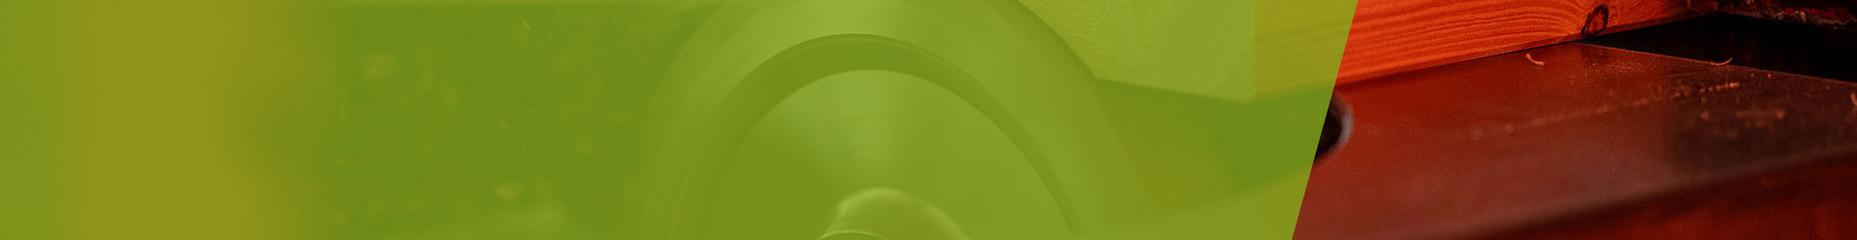 drevostavebni-panely-timeline-4